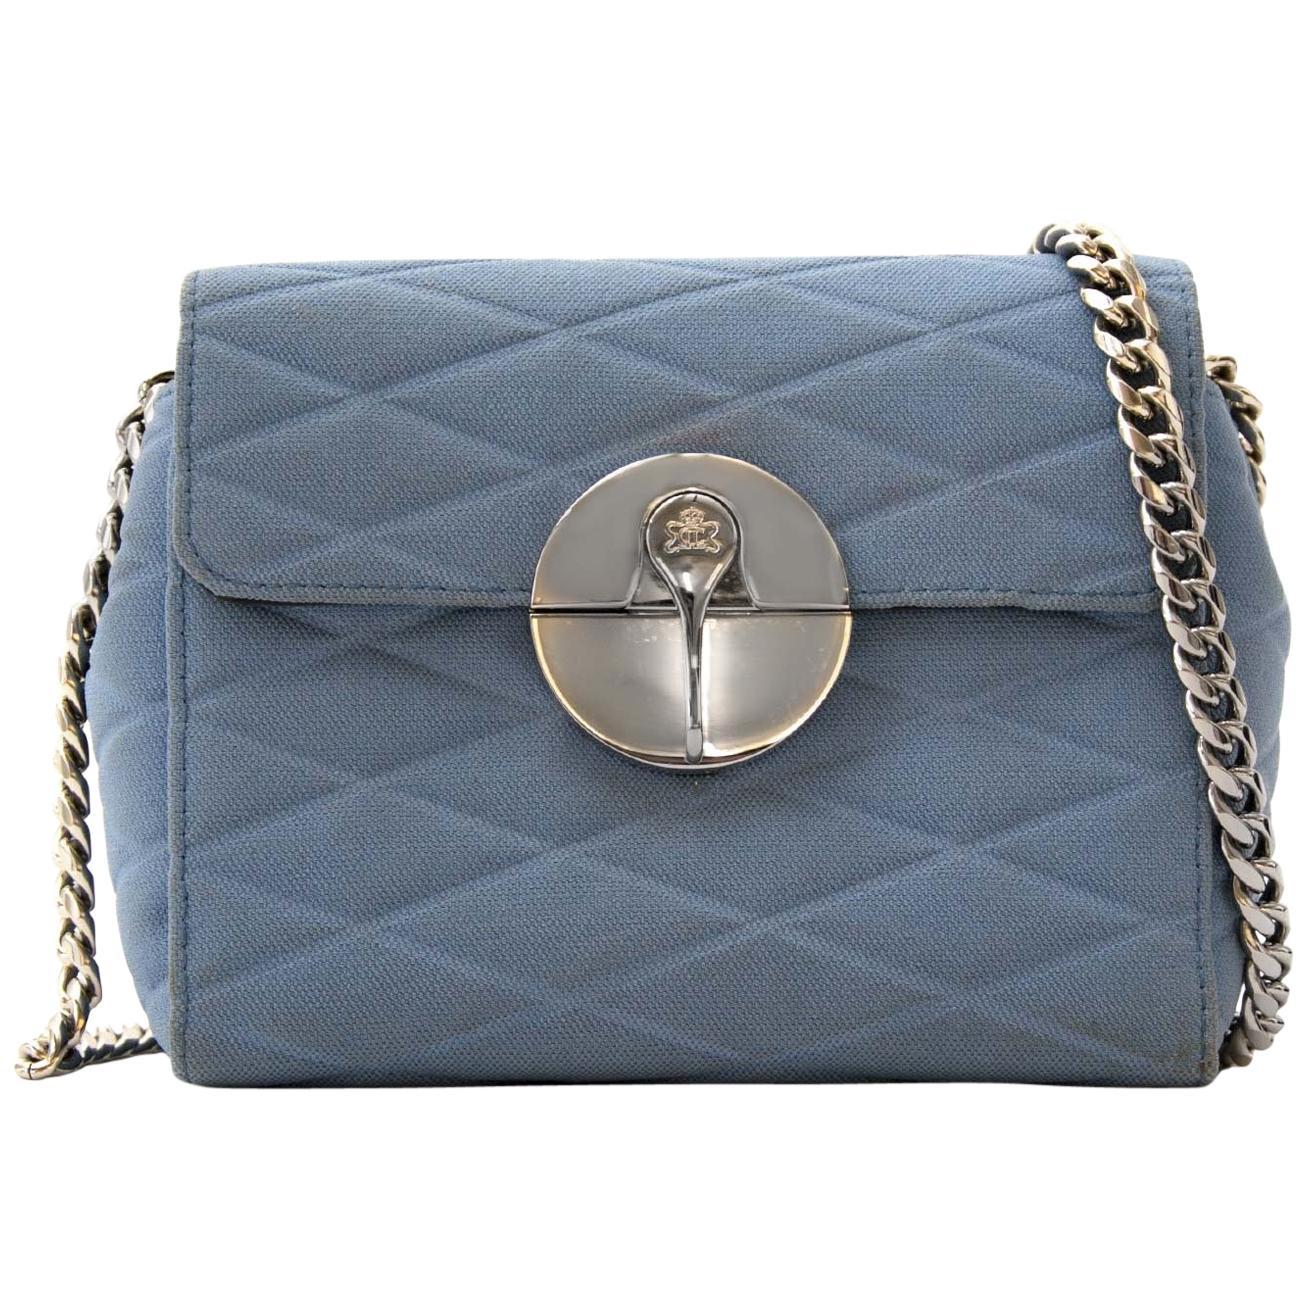 Lebeau-Courally Blue Mini Schoulderbag